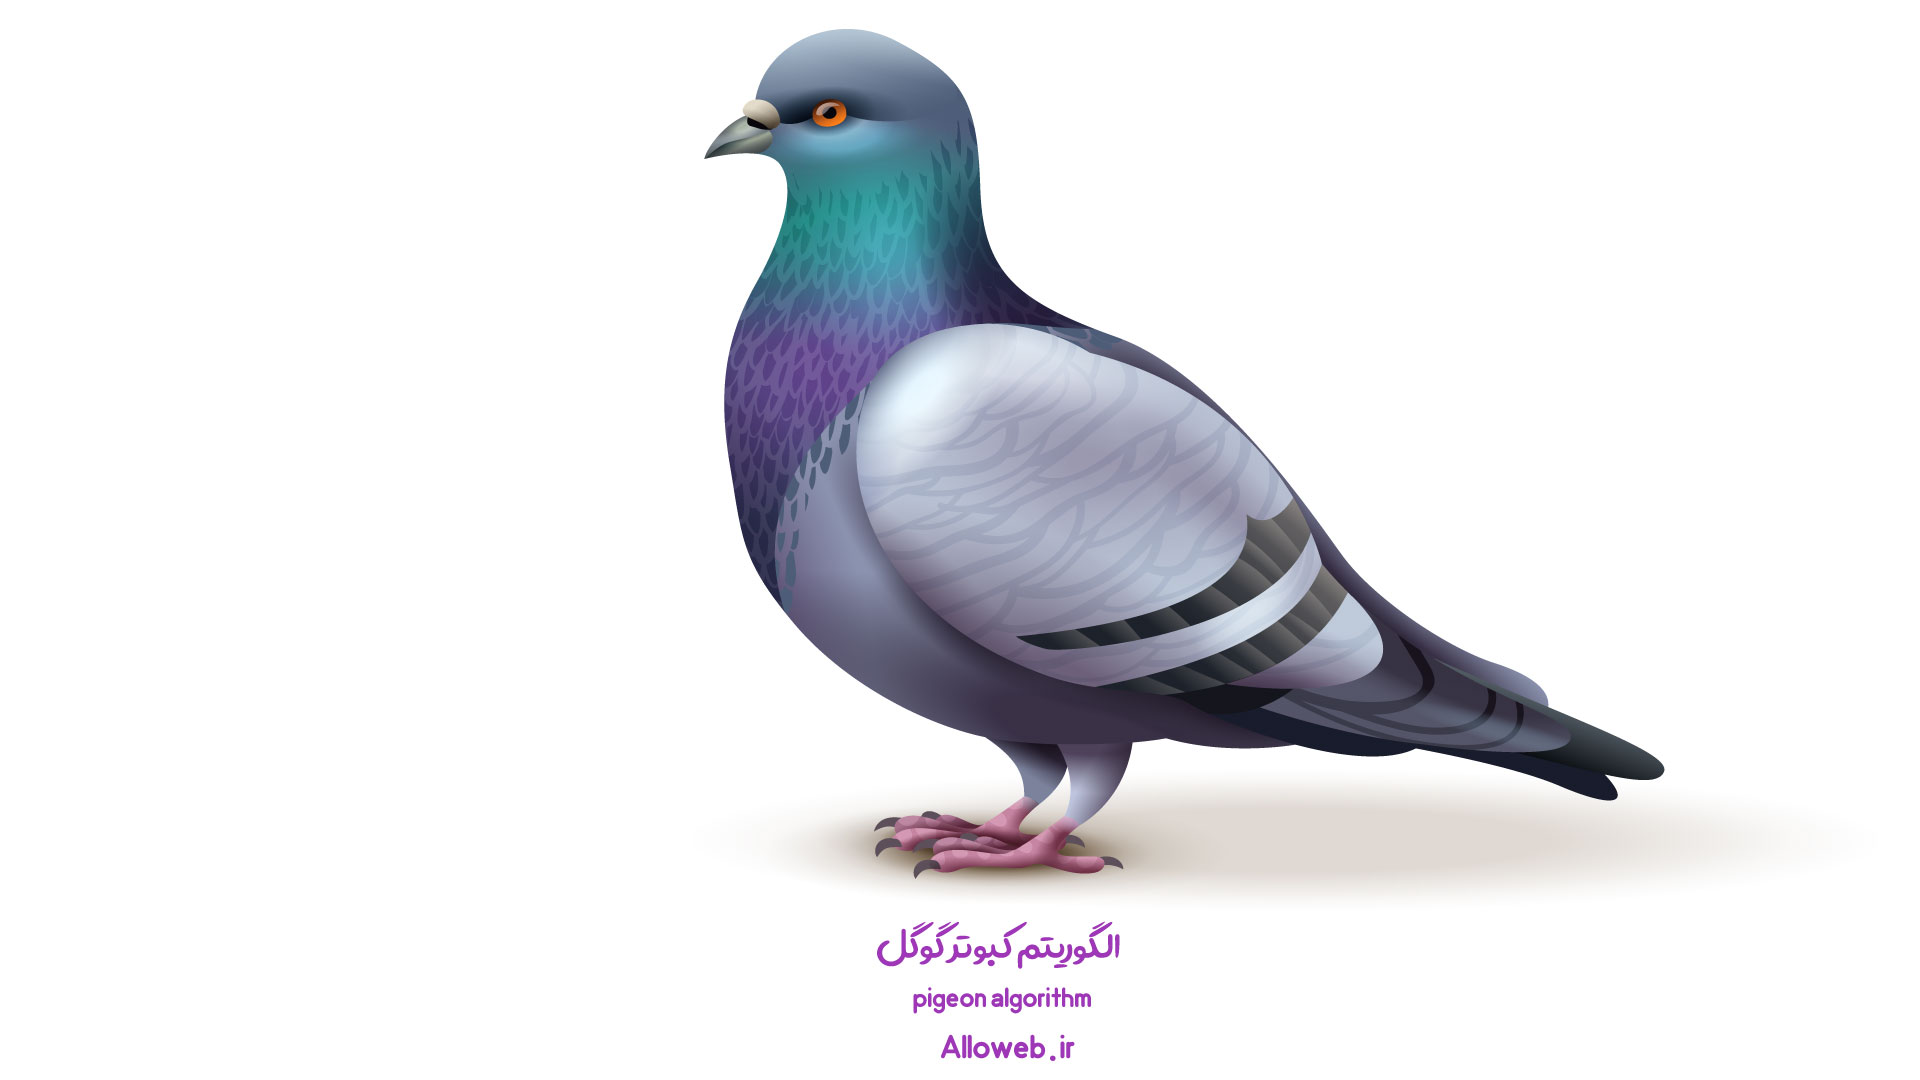 pigeon-algorithm-الگوریتم-کبوتر گوگل